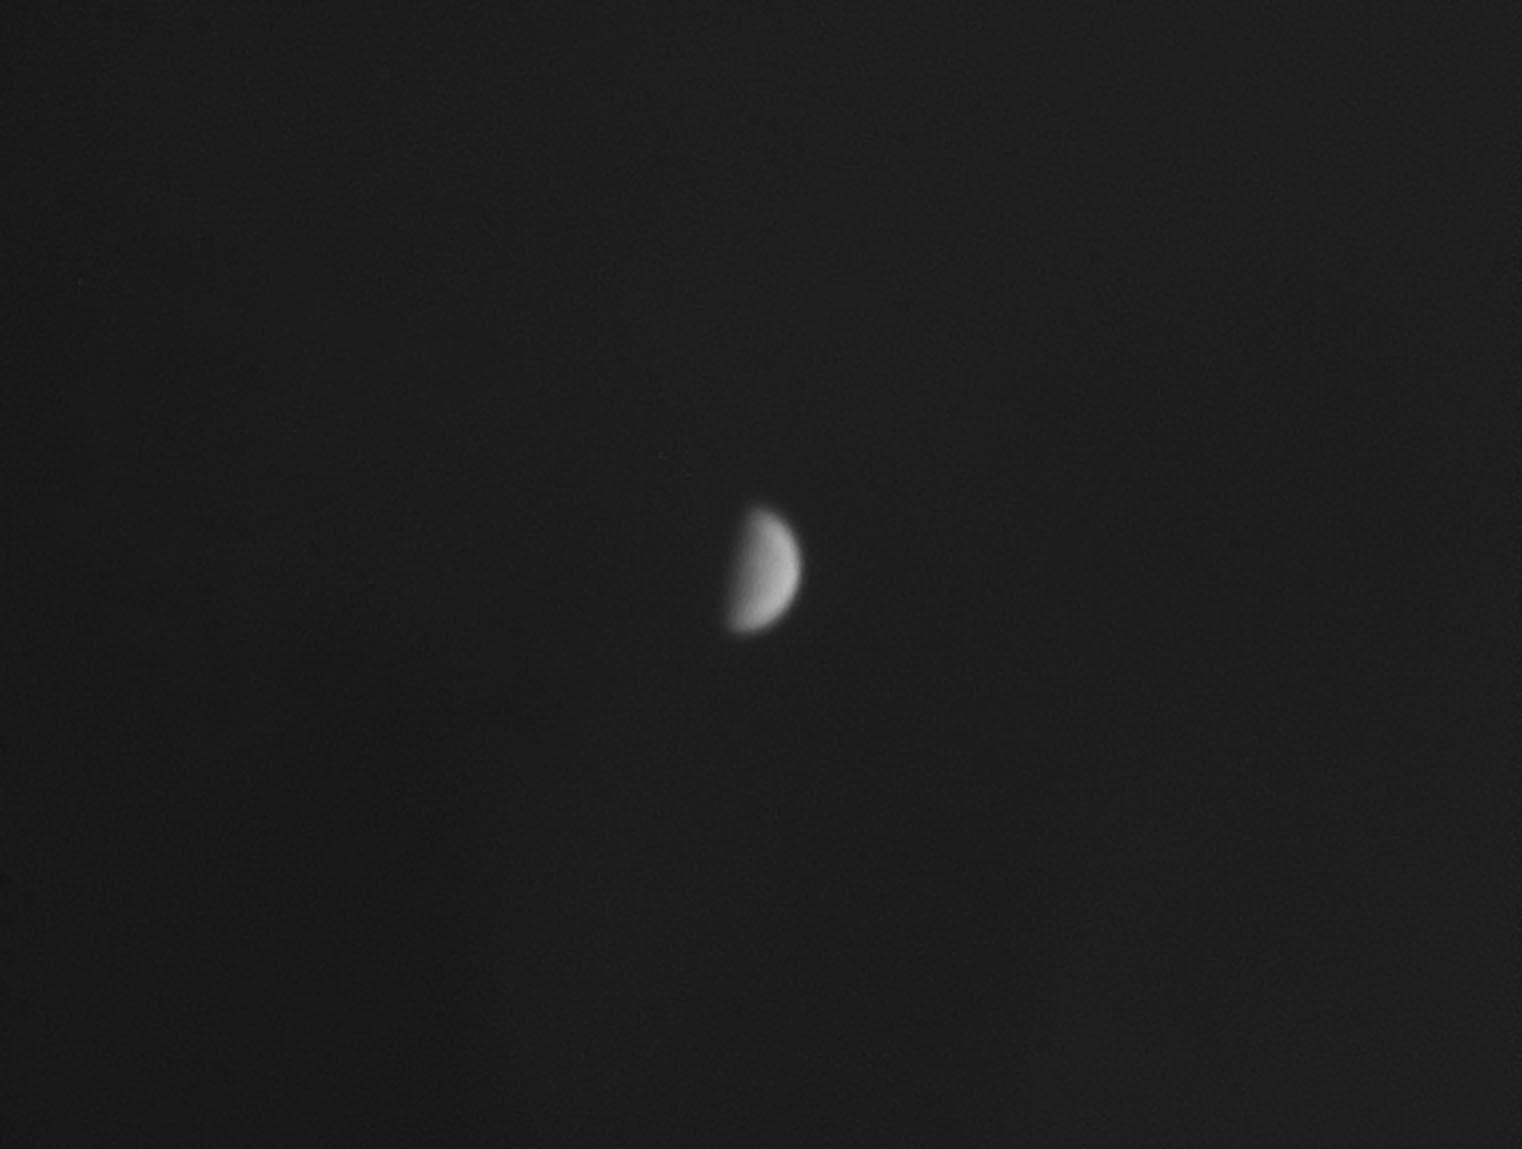 Schurs Astrophotography